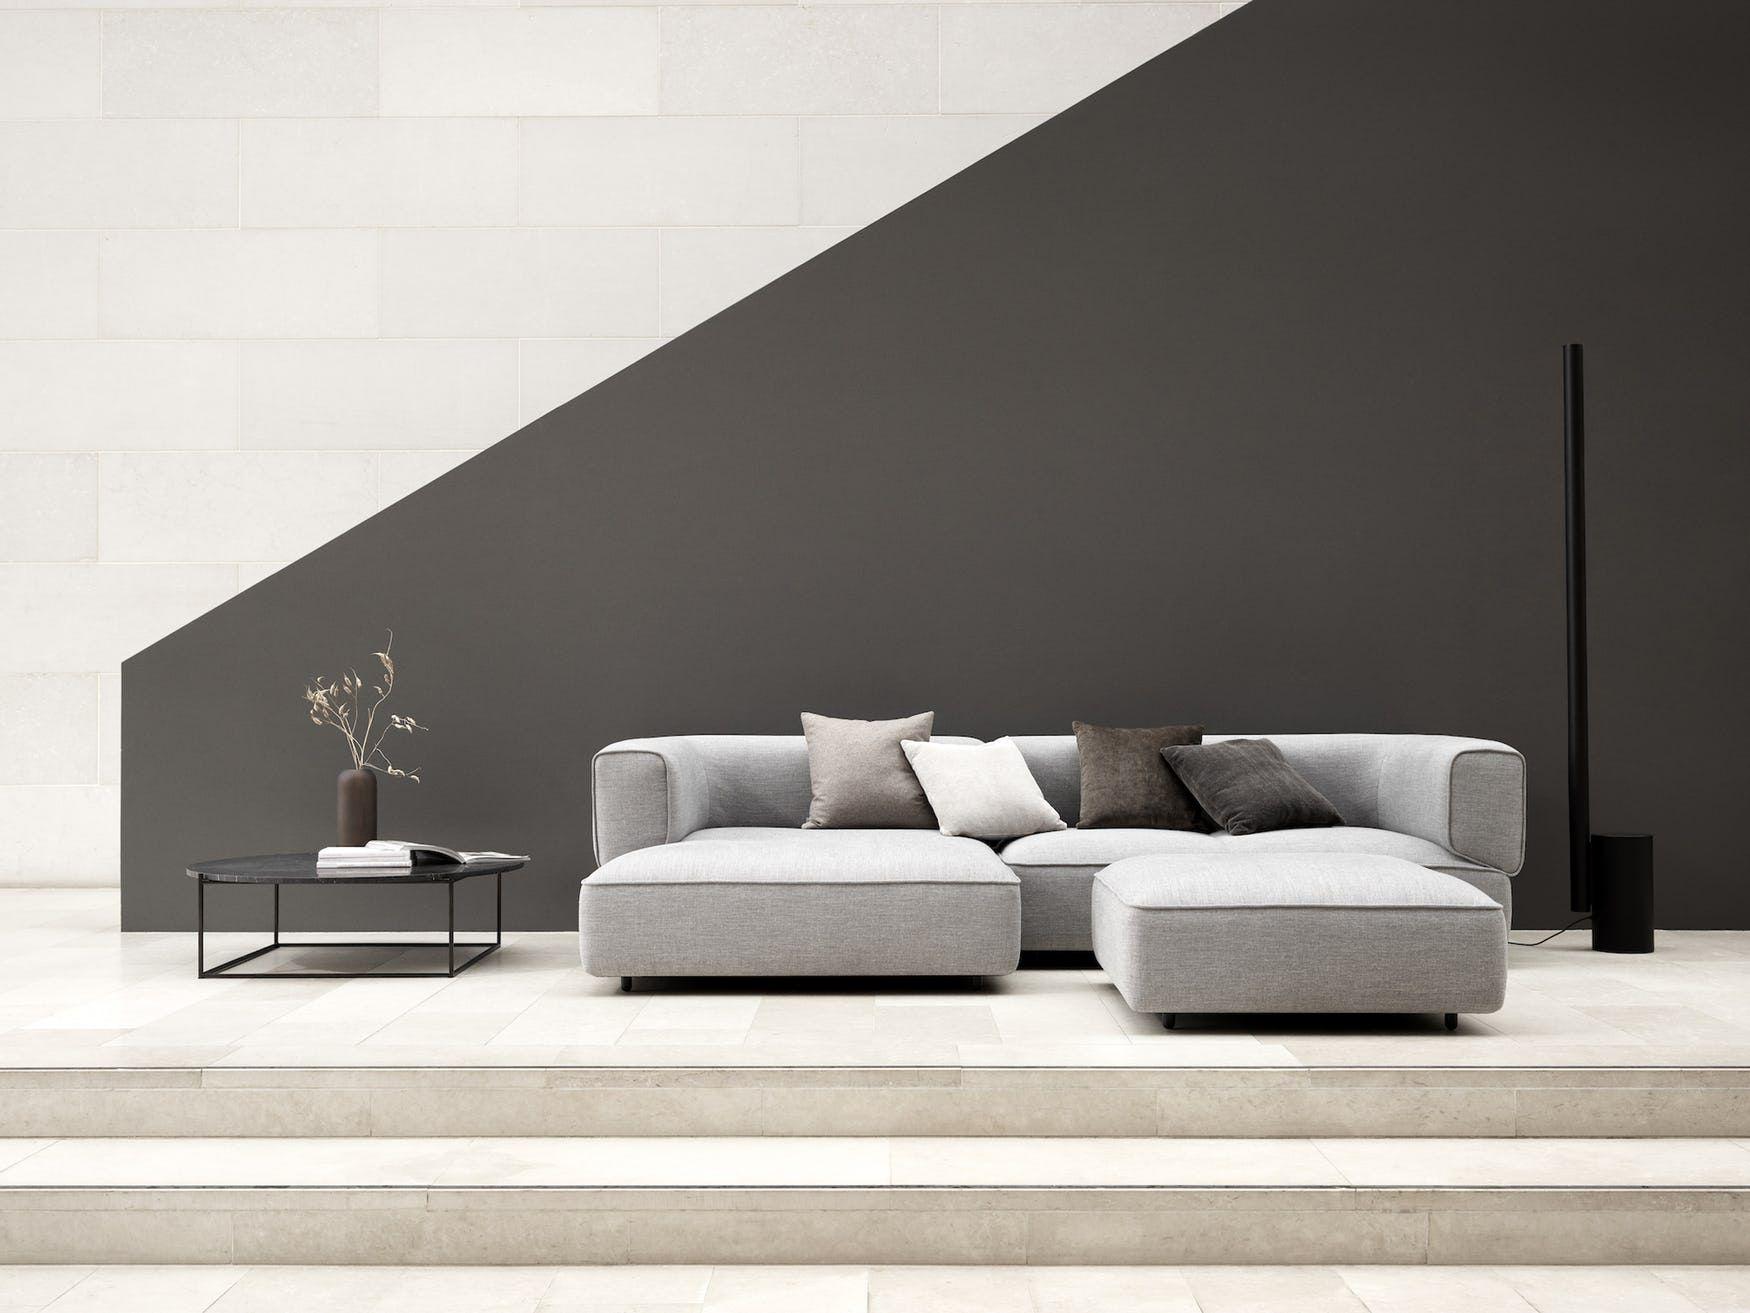 Poff Sofa By Wendelbo In 2020 Contemporary Furniture Design Sofa Design Contemporary Furniture